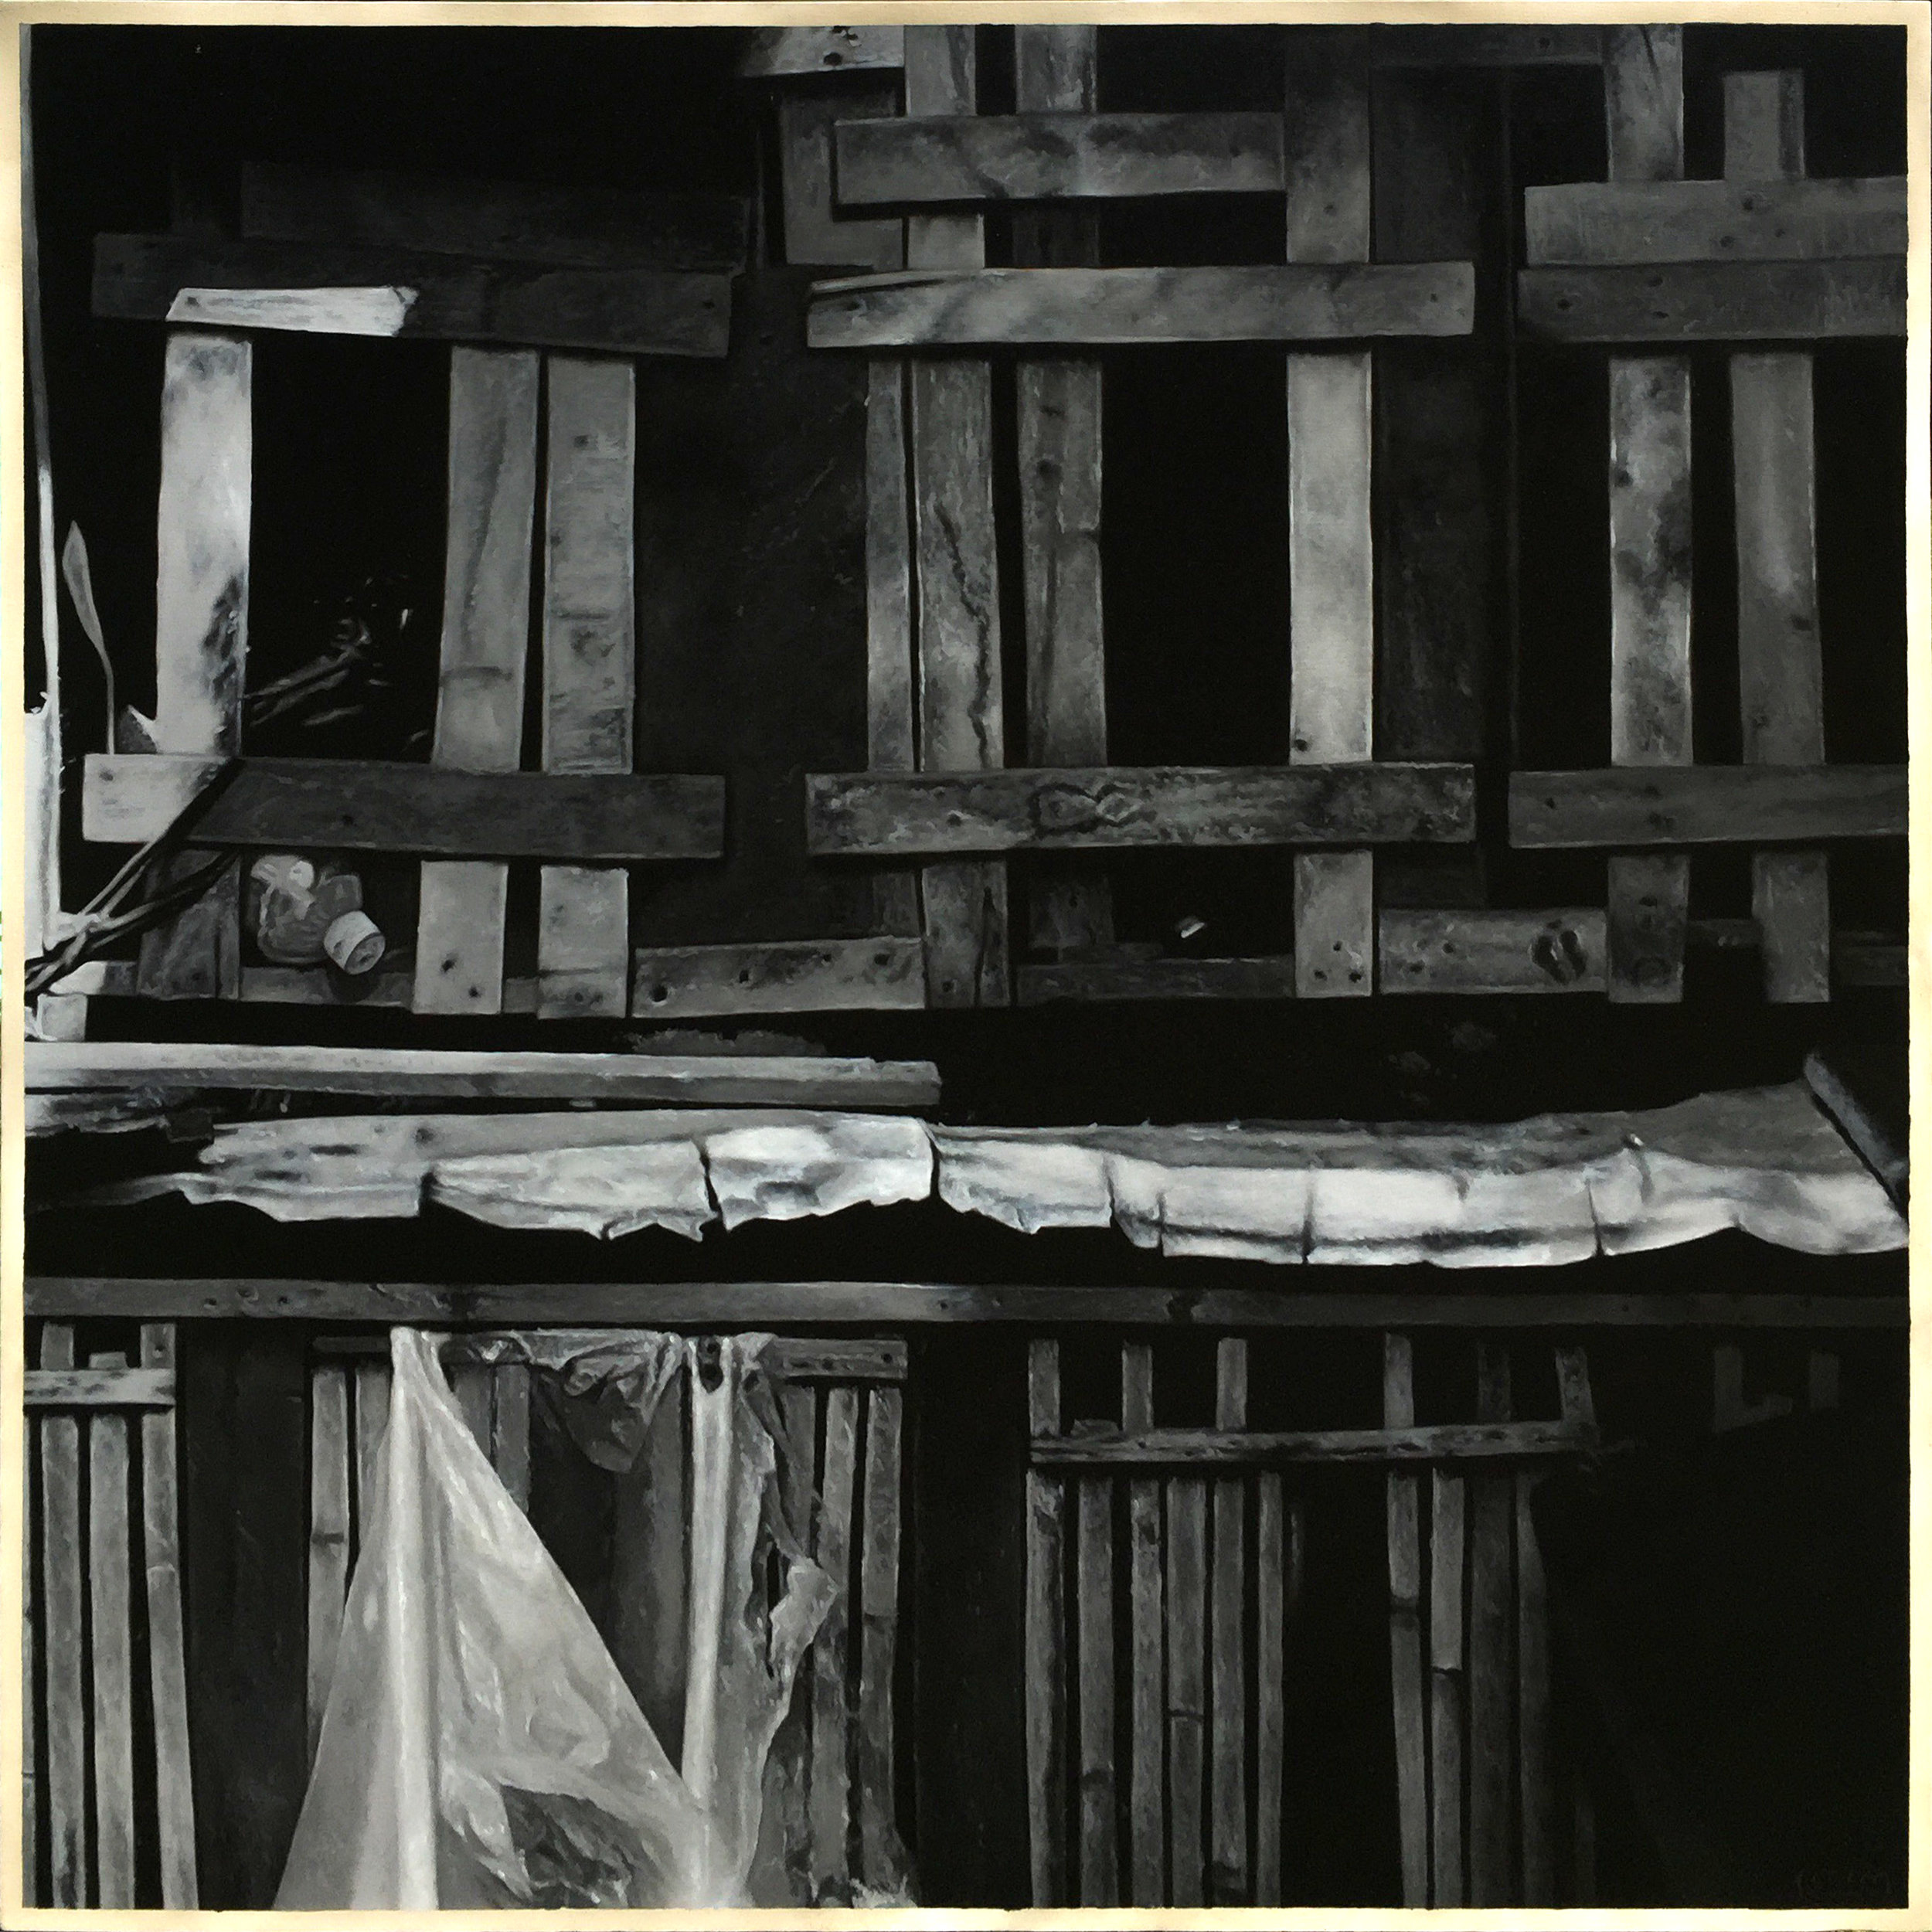 席康・森尼斯 _ Ciron Señeres〈自由|Freedom〉,油彩於畫布|Oil on canvas,152 cm x 152 cm|59.8 in x 59.8 in,2019.jpg